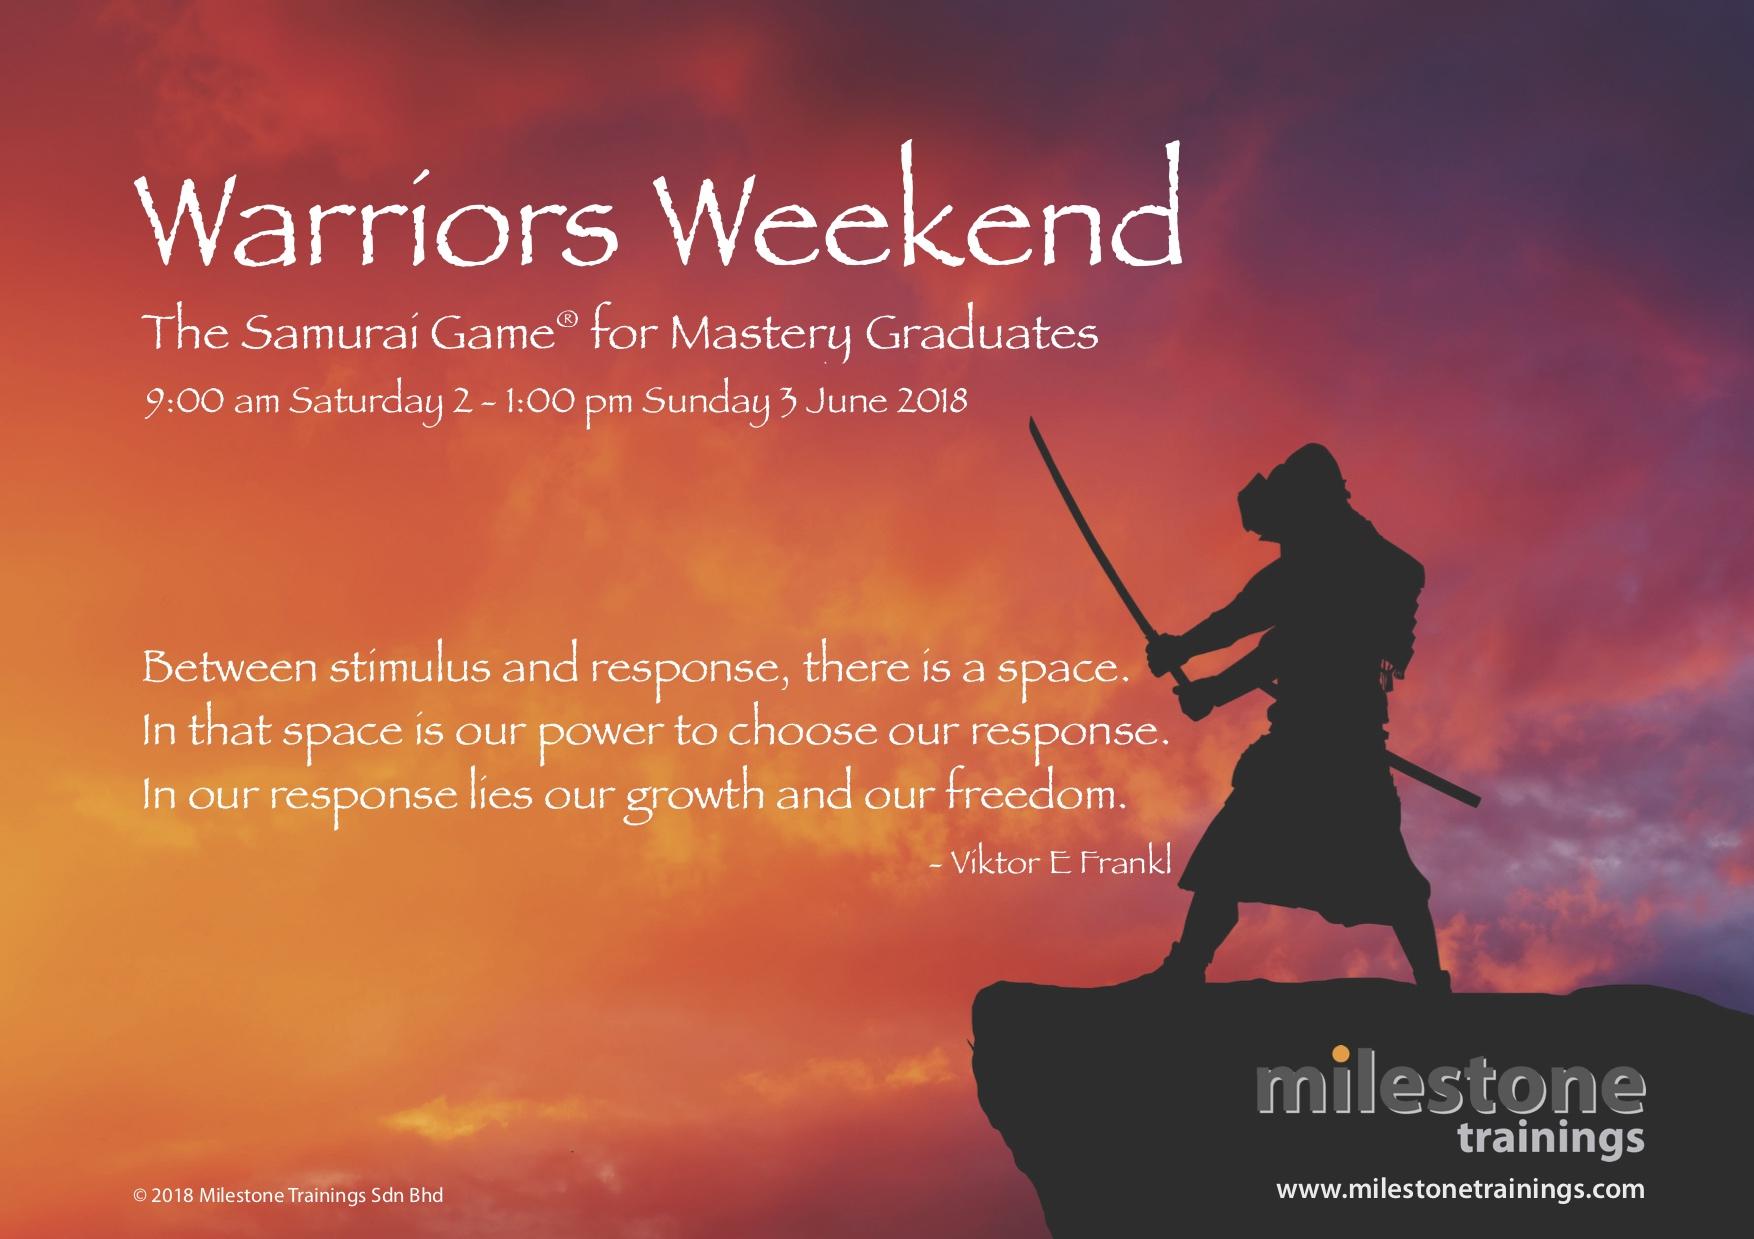 Warriors Weekend -- The Samurai Game for Mastery Graduates